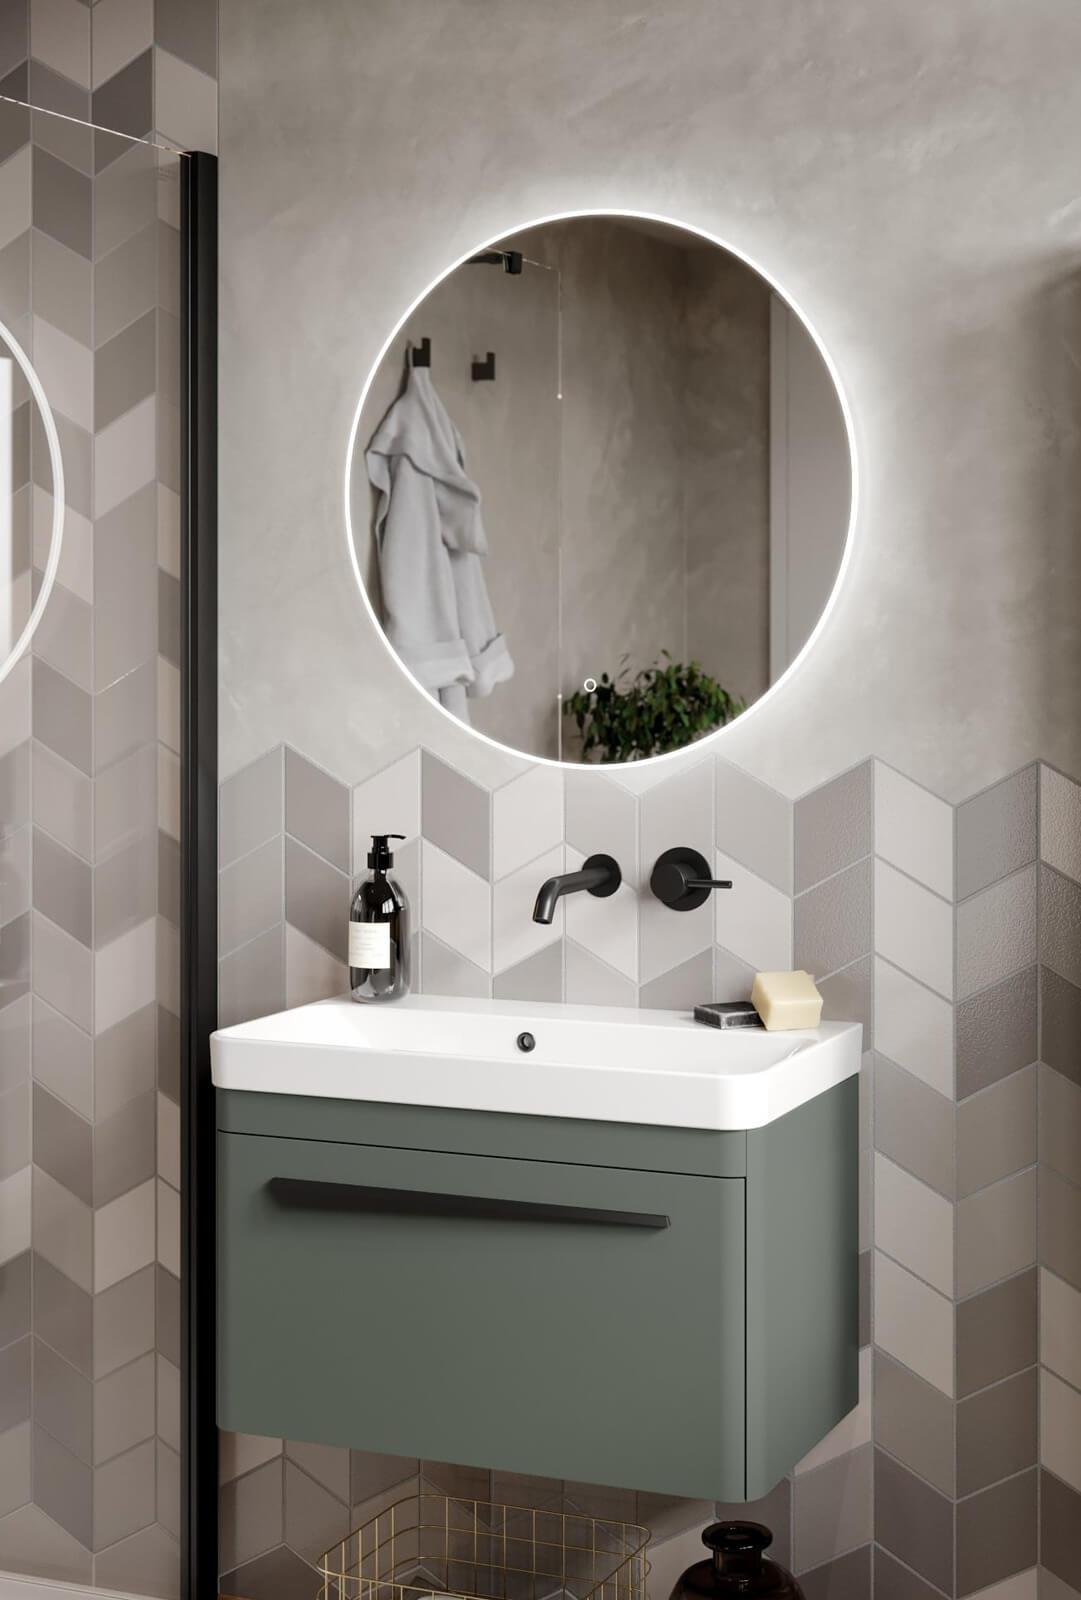 Saneux Oska Round Illuminated Led Mirror With Demister Pad